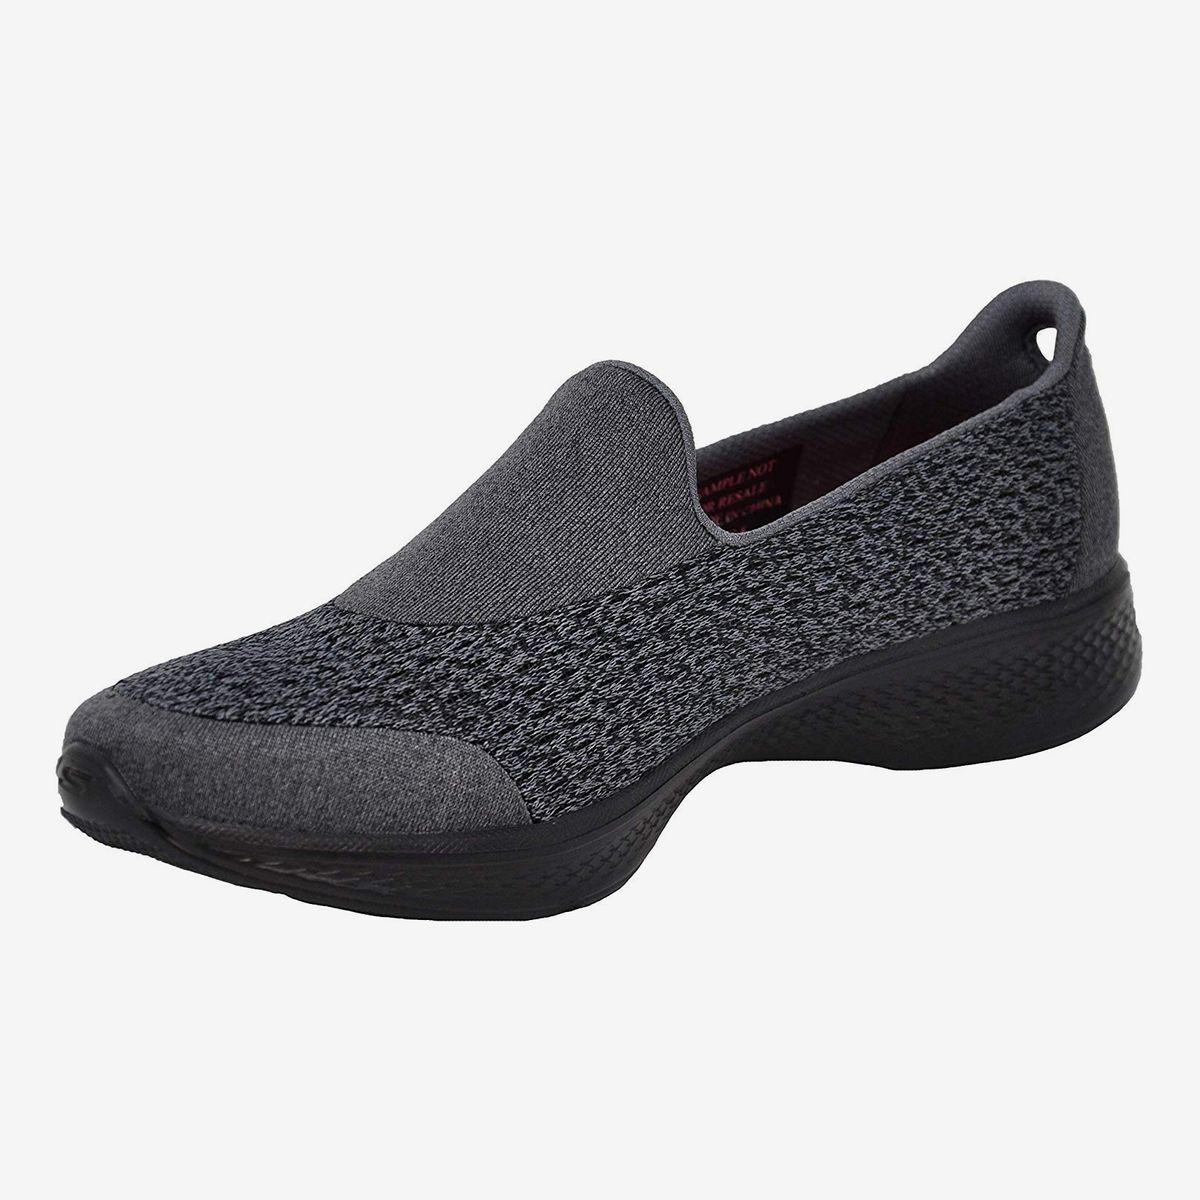 Womens Athletic Walking Sneakers Lightweigh Casual Mesh Comfortable Walk Tennis Slip on Shoes